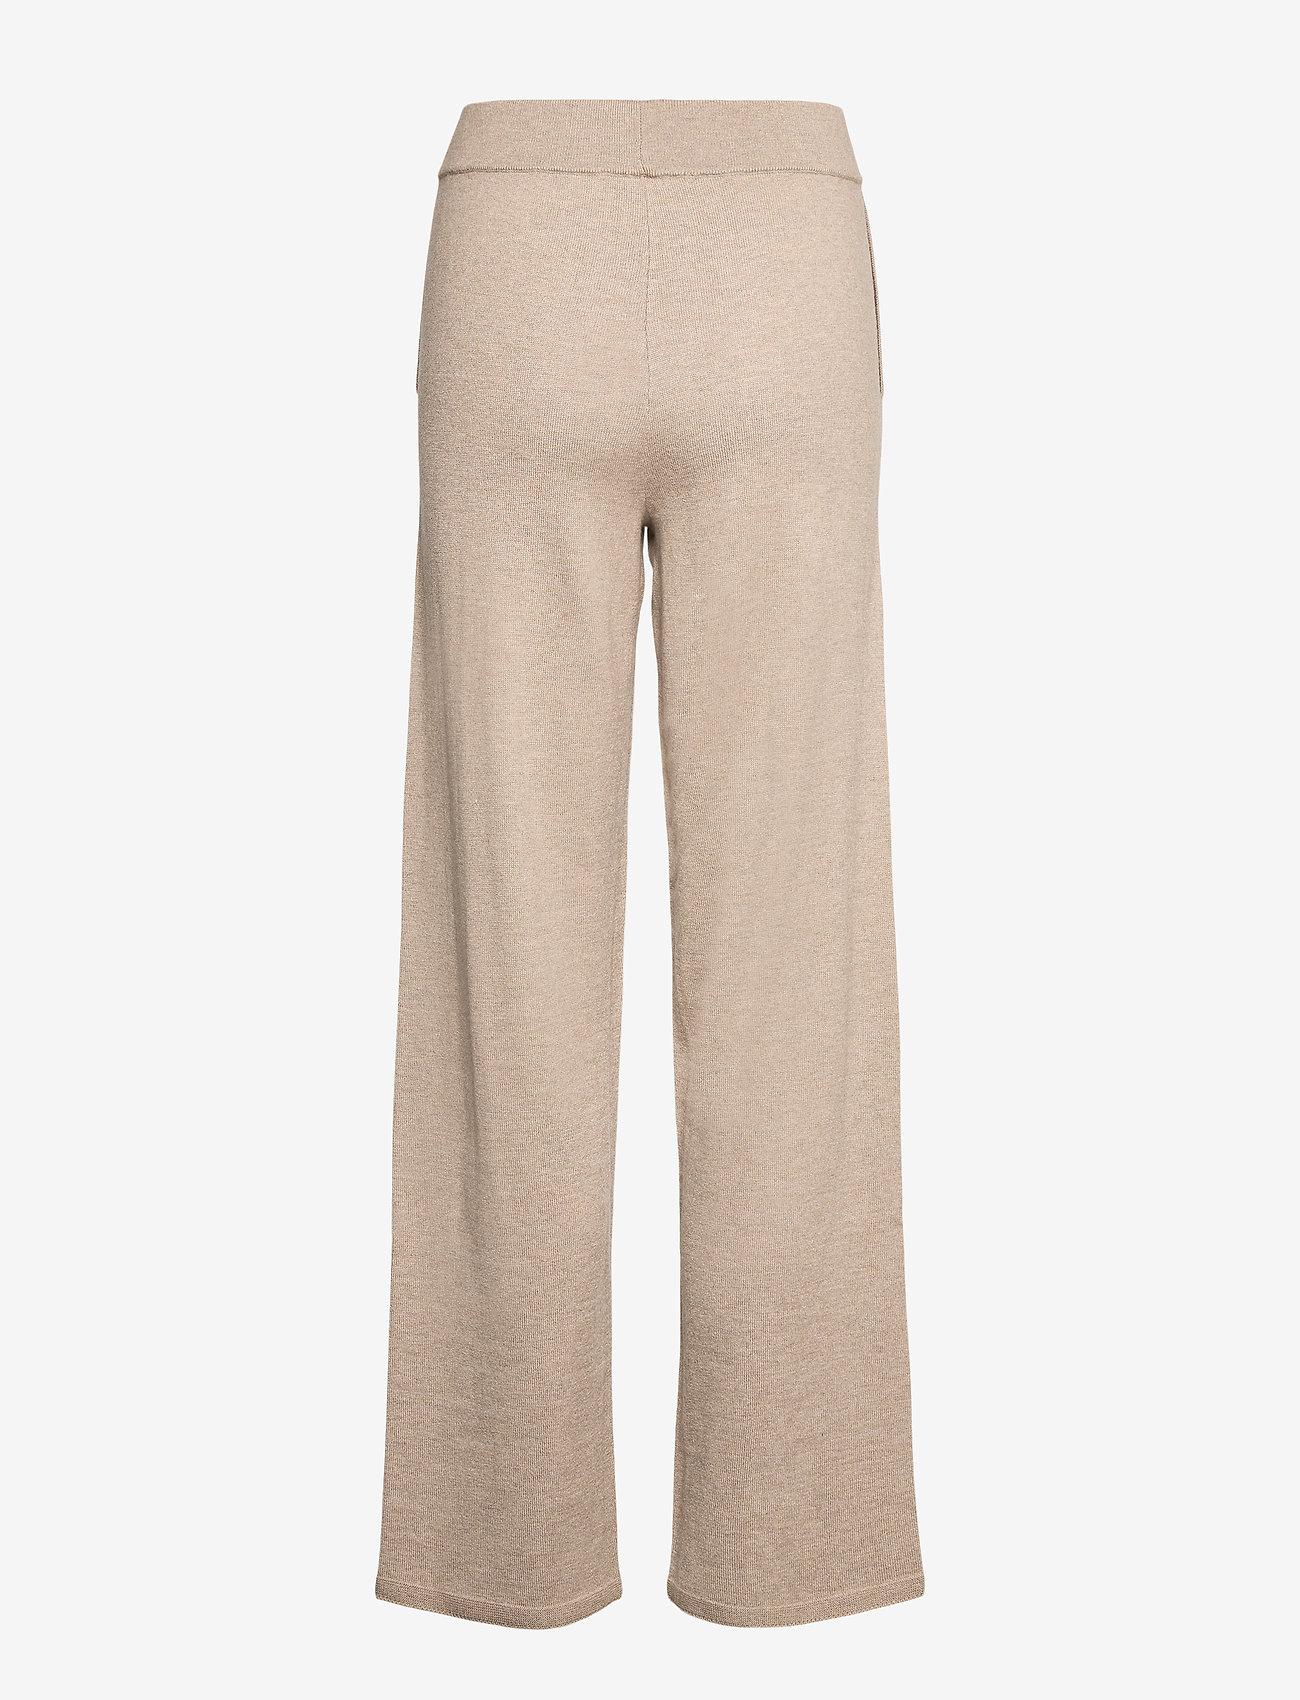 Selected Femme - SLFINKA MW LONG KNIT PANT - sweatpants - sand - 1